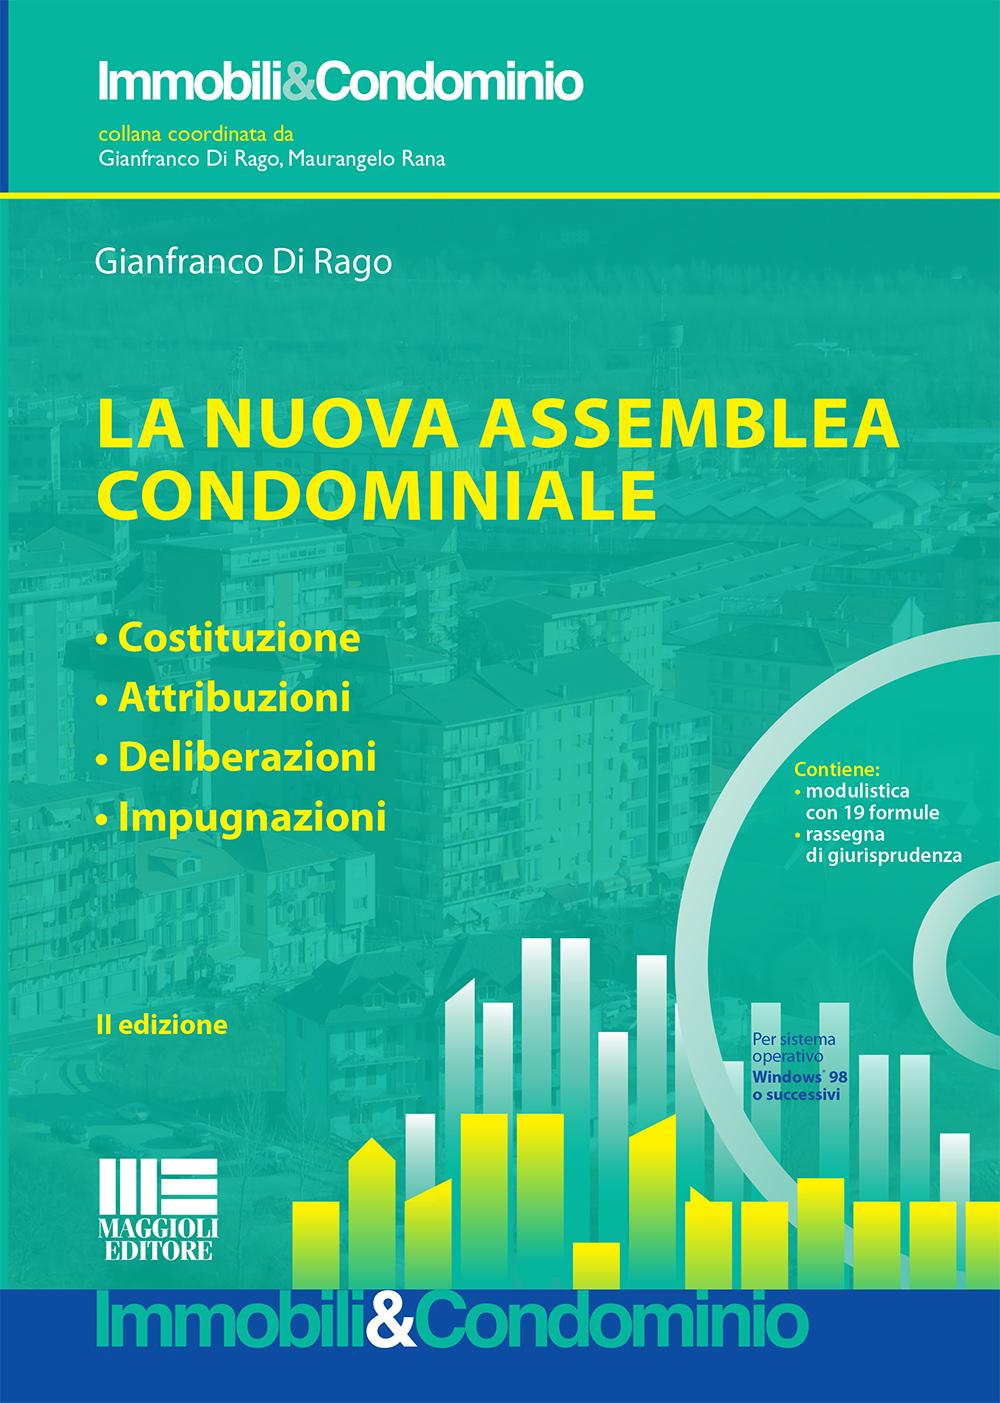 La nuova assemblea condominiale - Libro carta